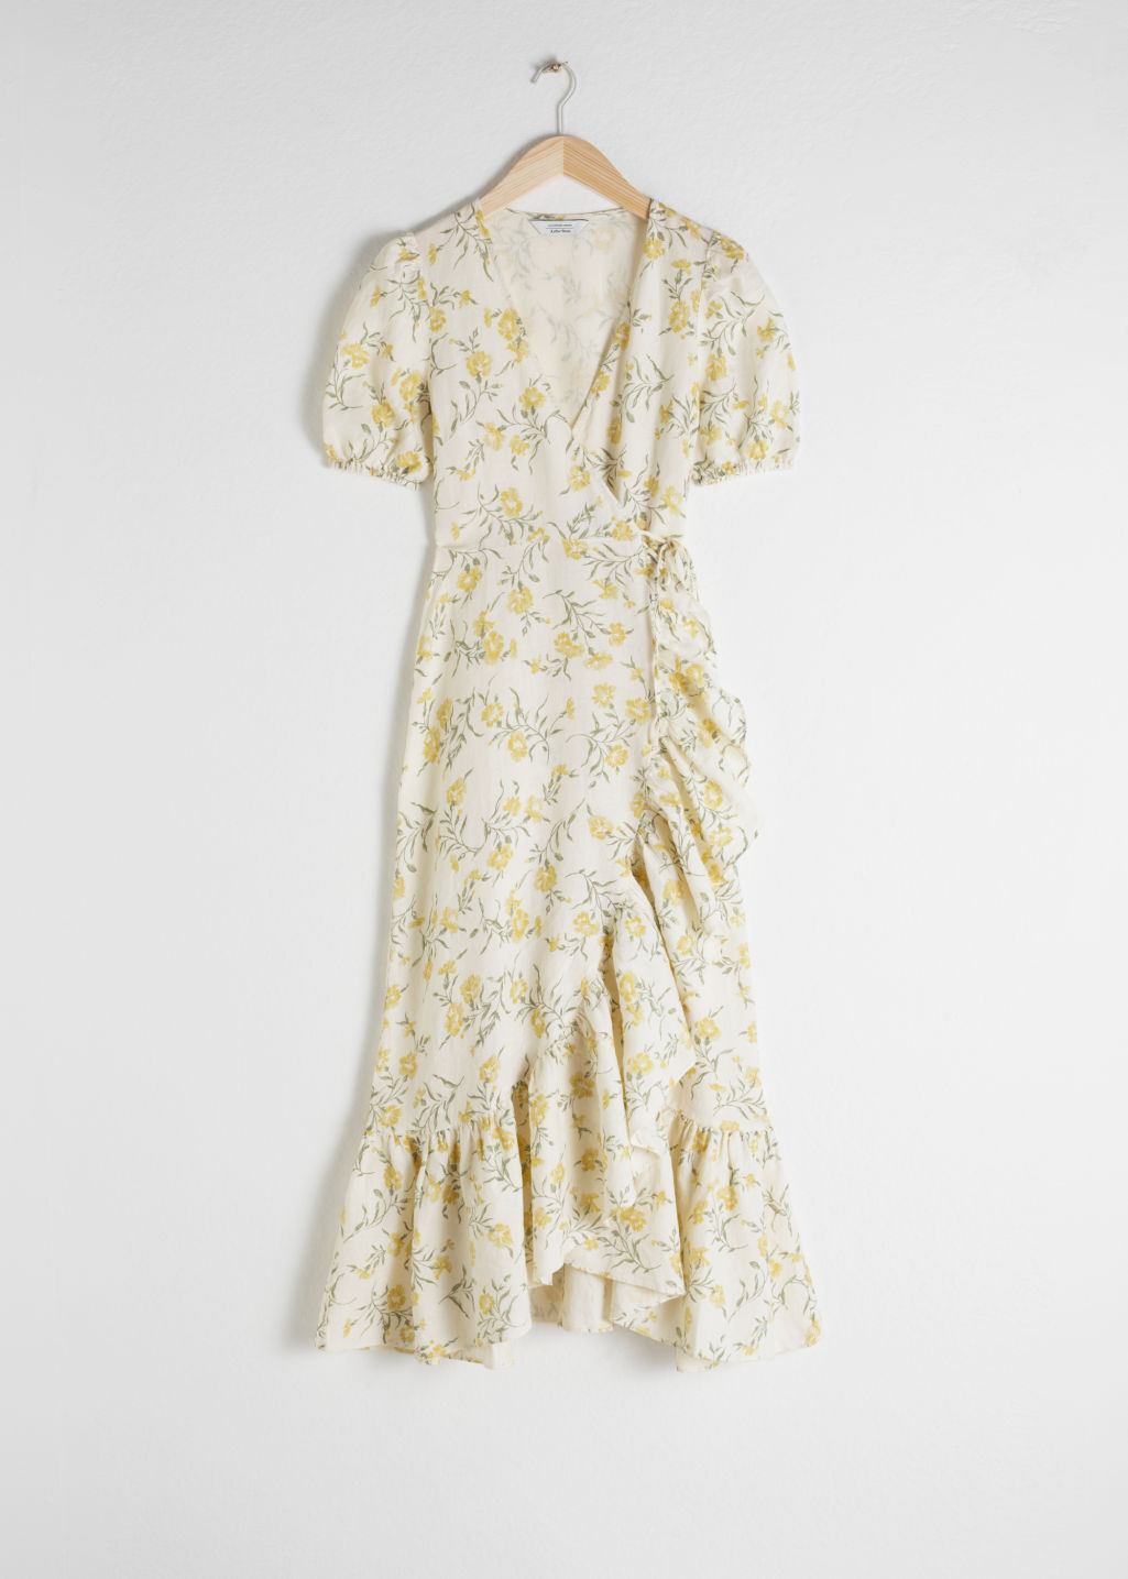 e6adbc4c3b97 Ruffled Linen Wrap Midi Dress - Floral Print - Midi dresses ...